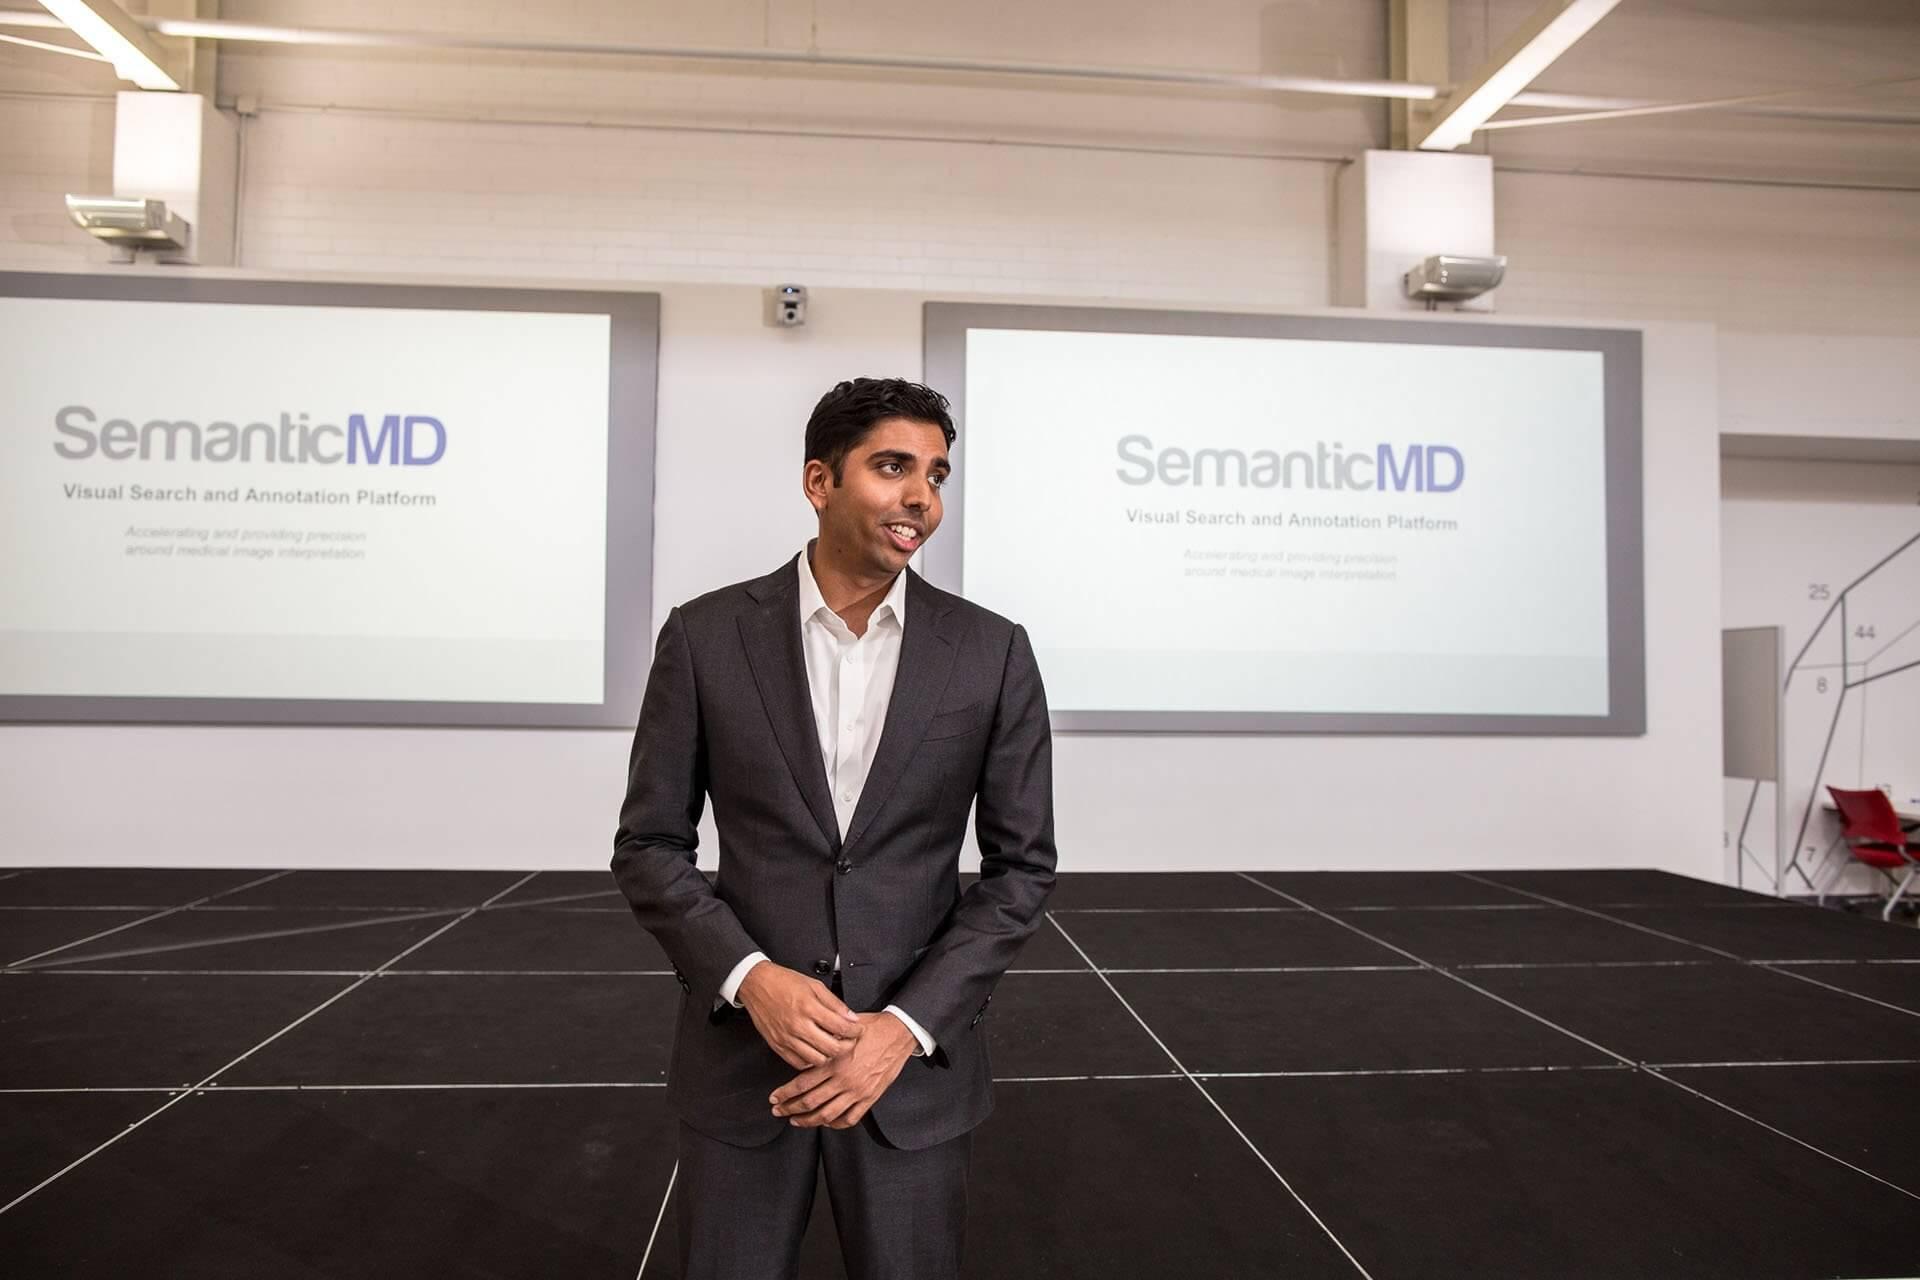 Santosh Bhavani, chief executive officer of SemanticMD